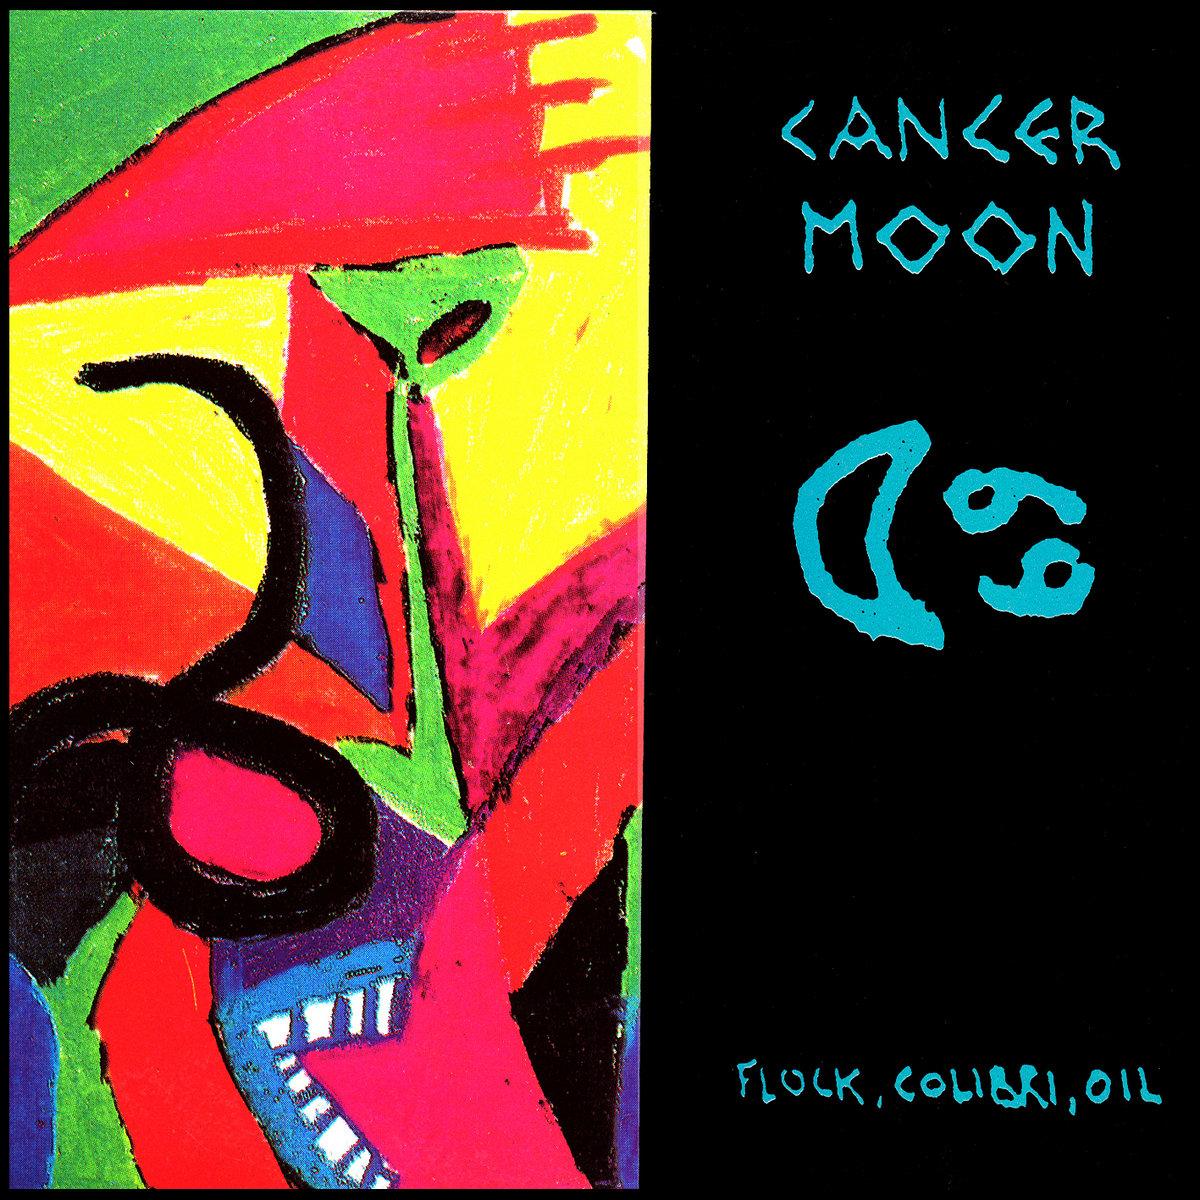 Cancer Moon - Página 2 A2235965085_10